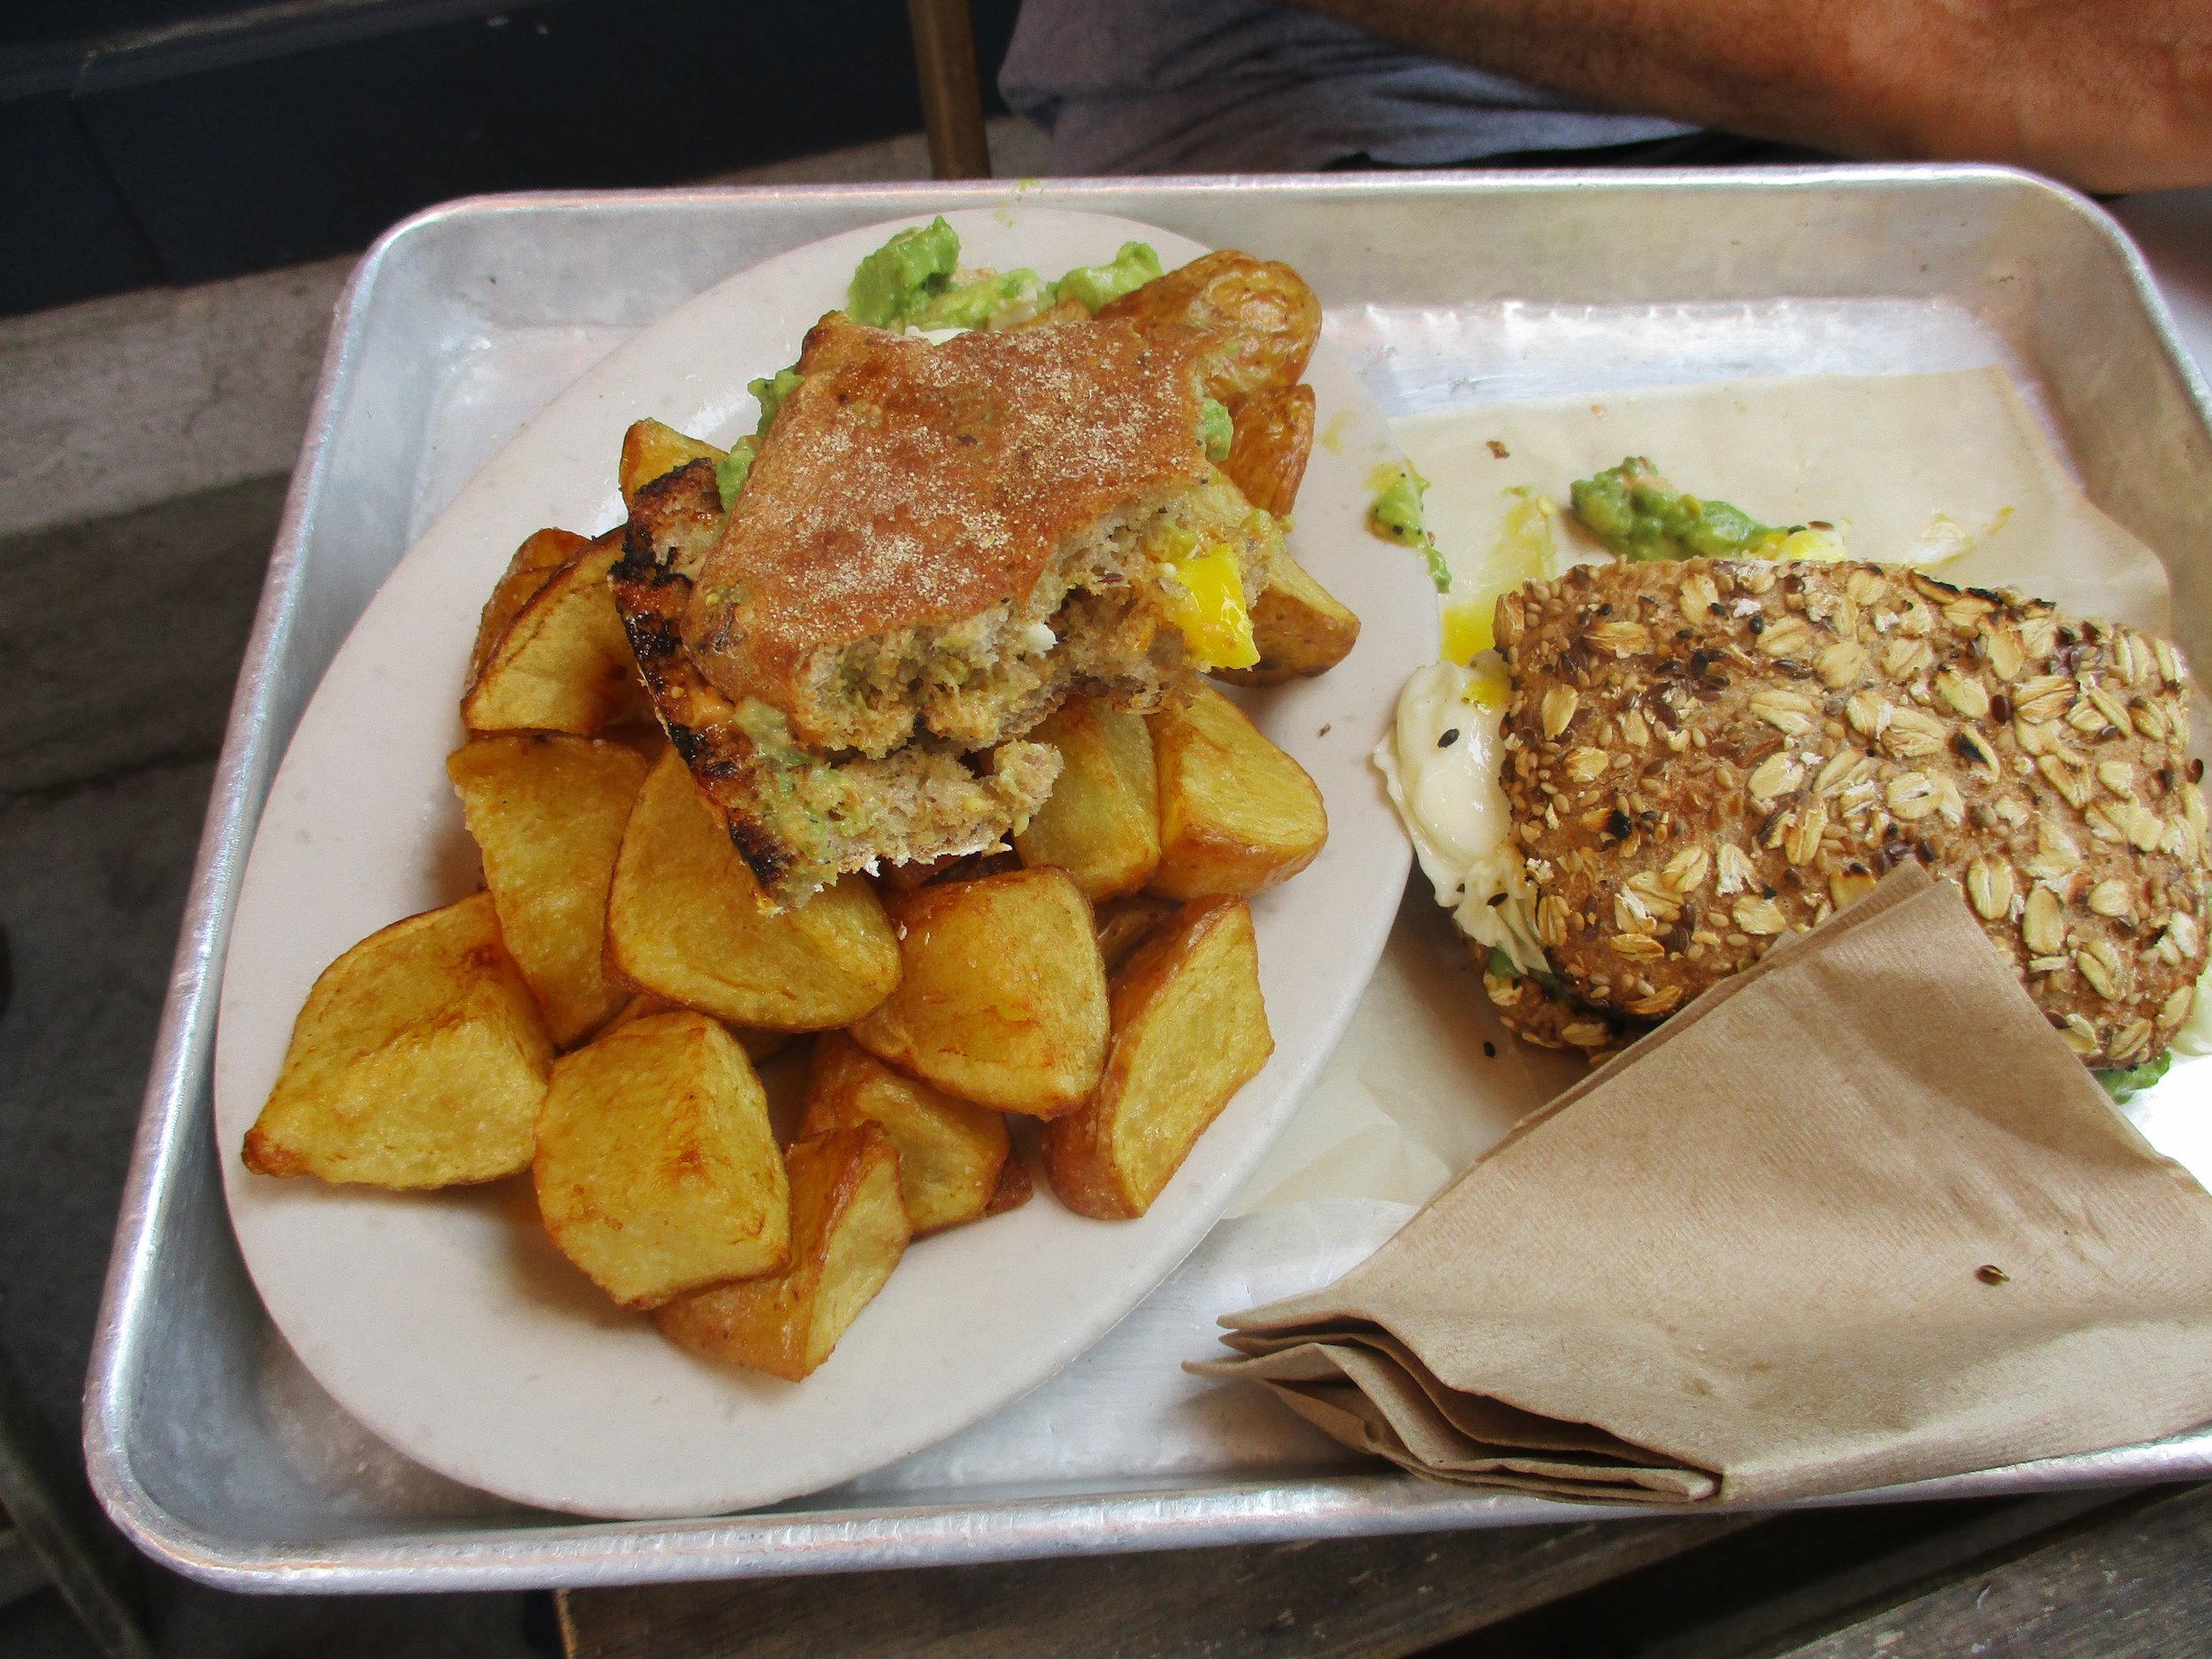 Famous chicken sandwich half eaten on potatos at Lincoln Station